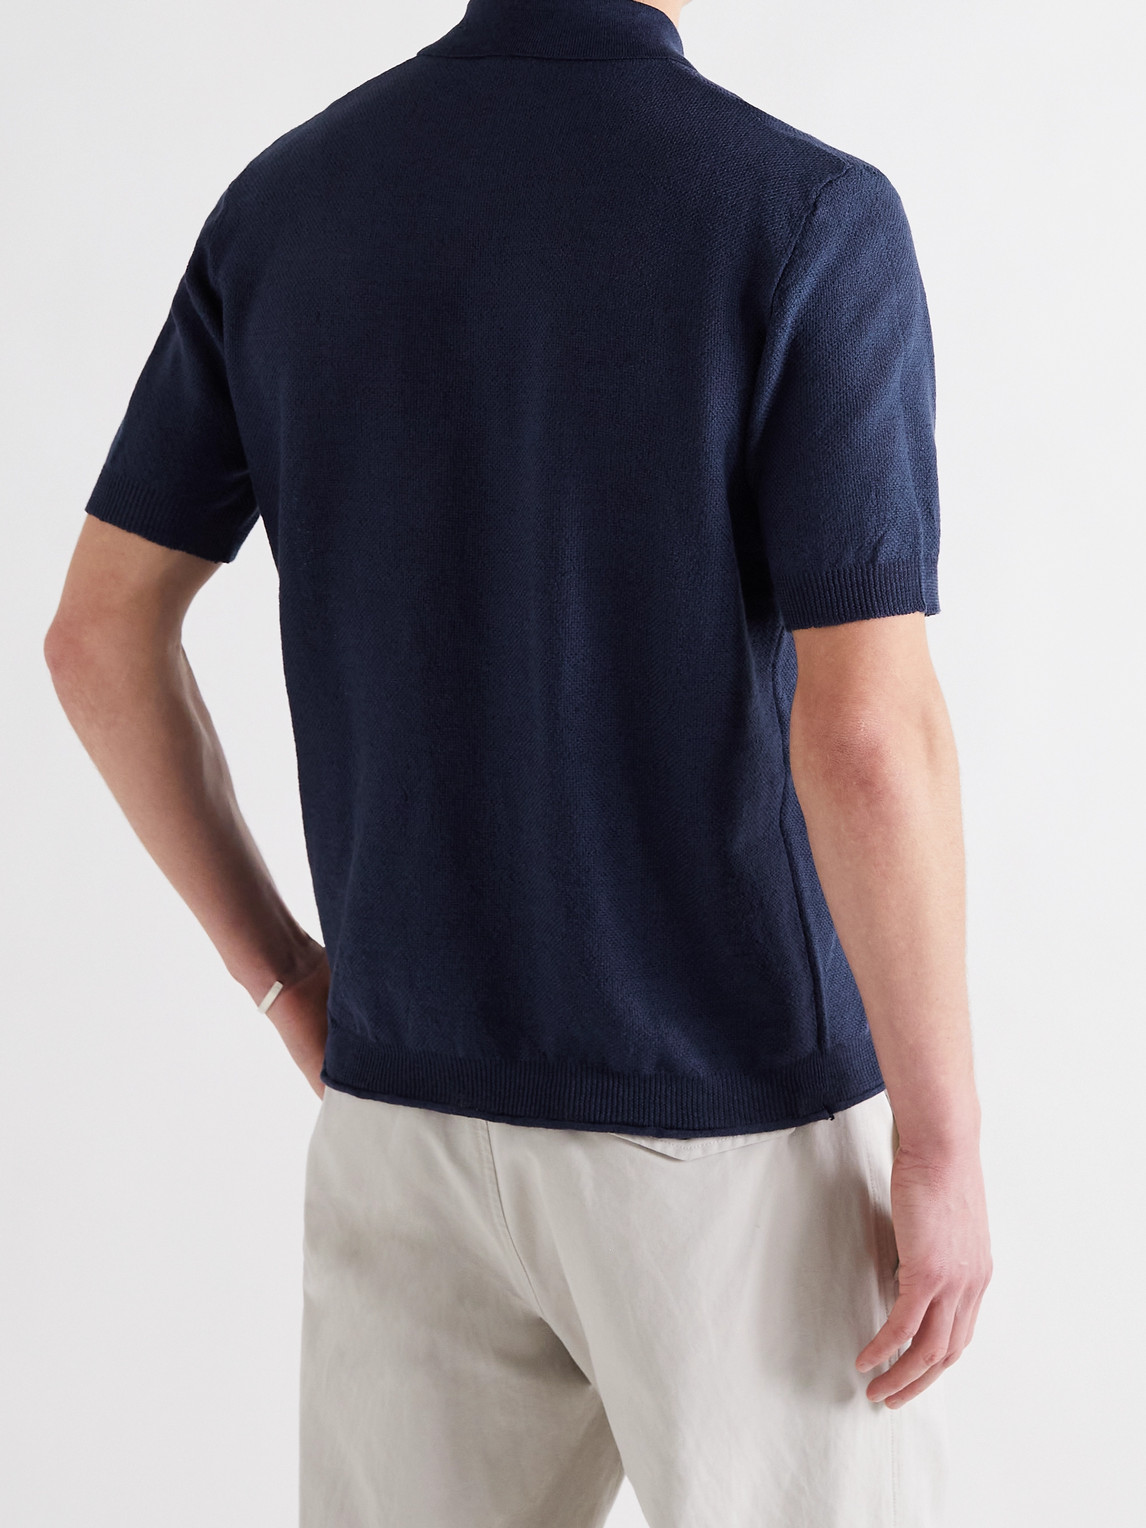 BARENA VENEZIA Shirts MARCO LINEN POLO SHIRT